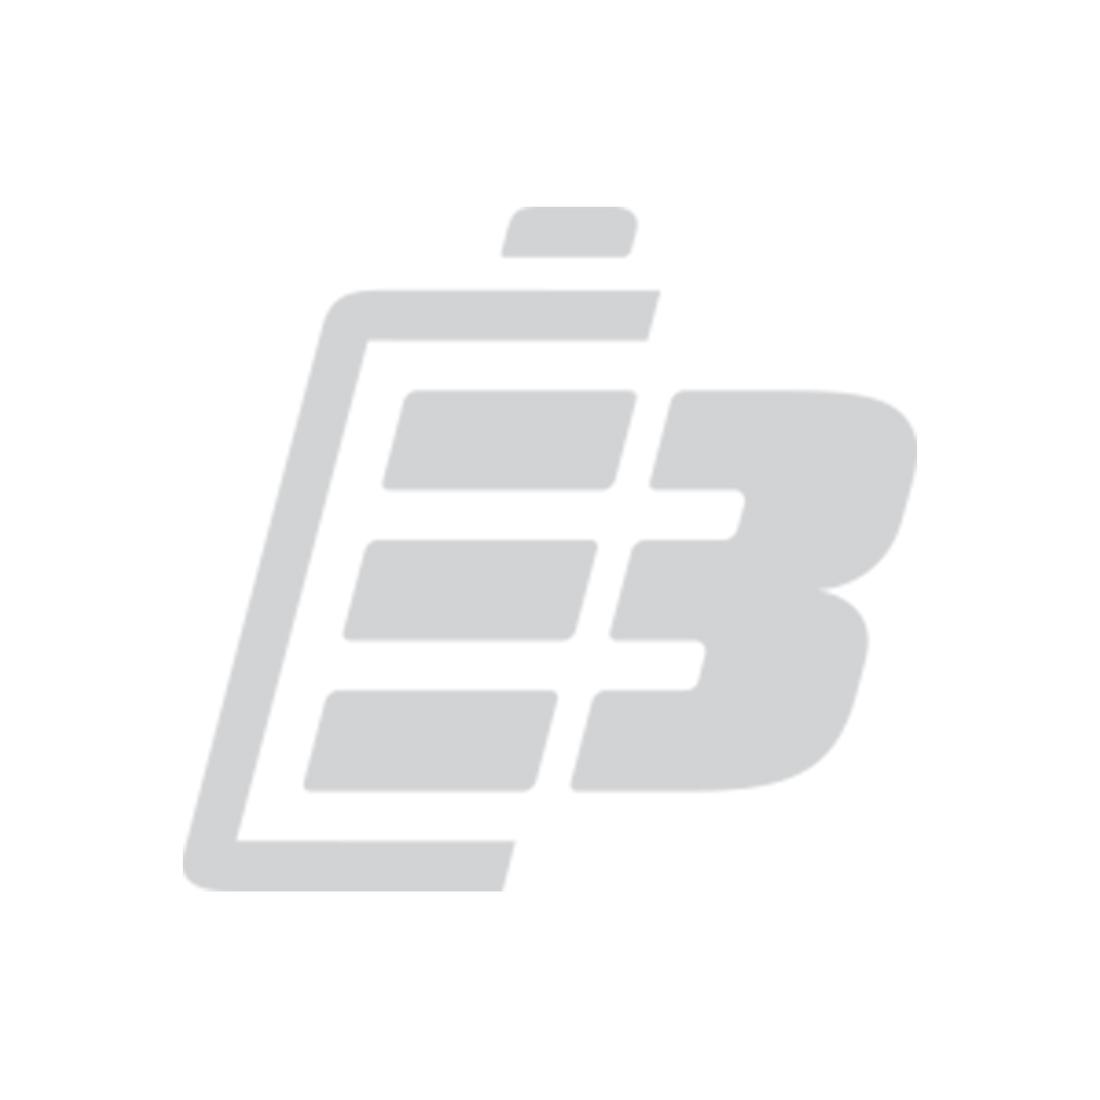 Smartphone battery Huawei P9 Lite_1